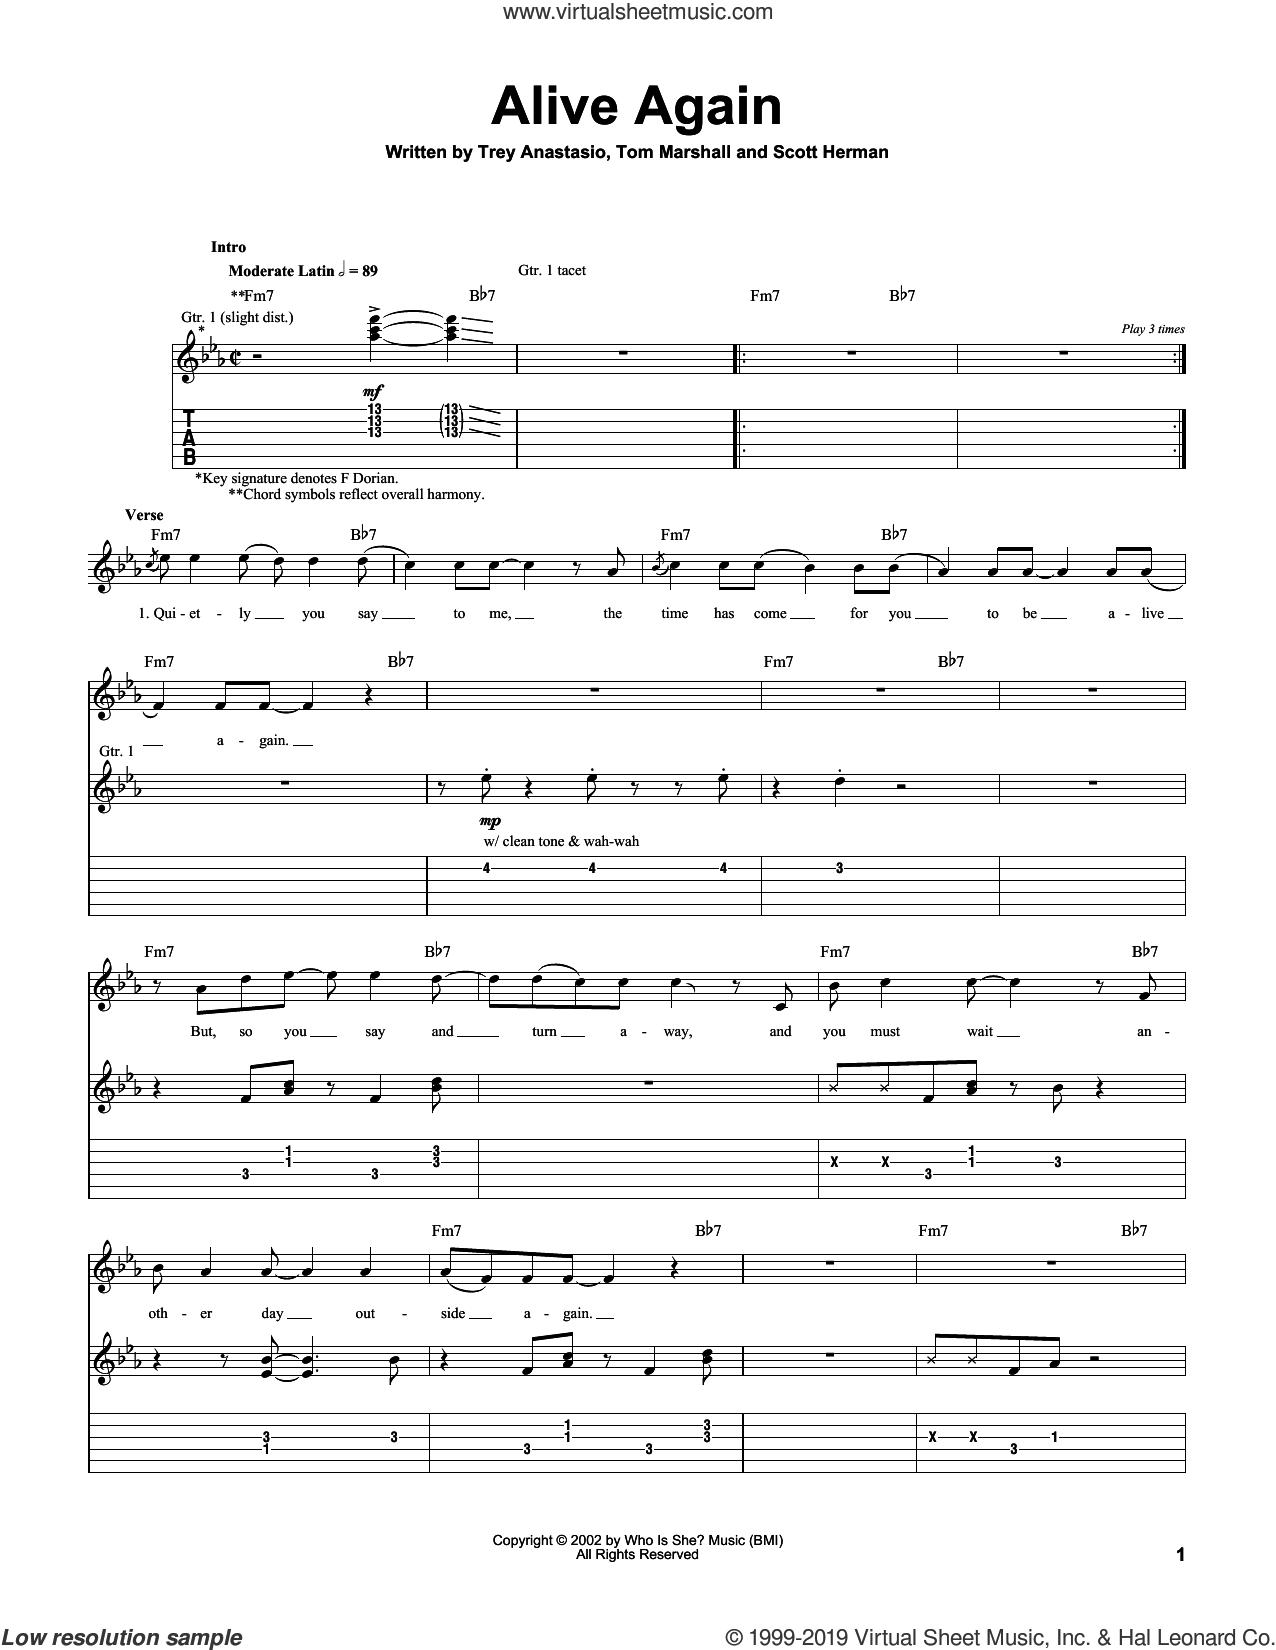 Alive Again sheet music for guitar (tablature) by Trey Anastasio, Scott Herman and Tom Marshall, intermediate skill level